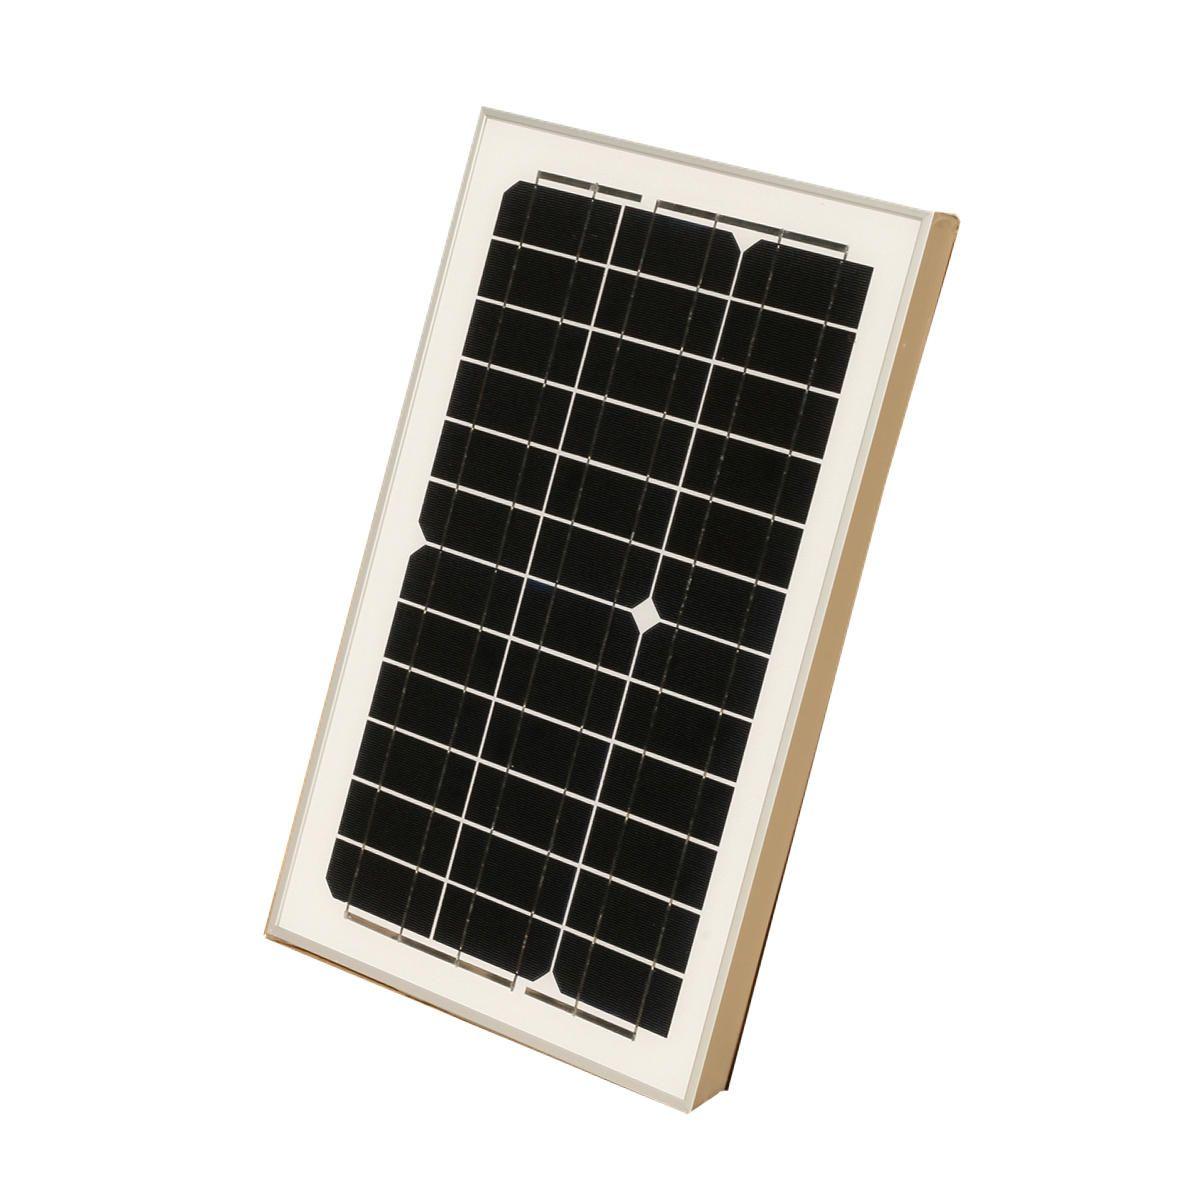 Us 52 65 15w 18v Monocrystalline Silicon Aluminum Frame Solar Panel Arduino Compatible Scm Diy Kits From Electronics On Banggood Com